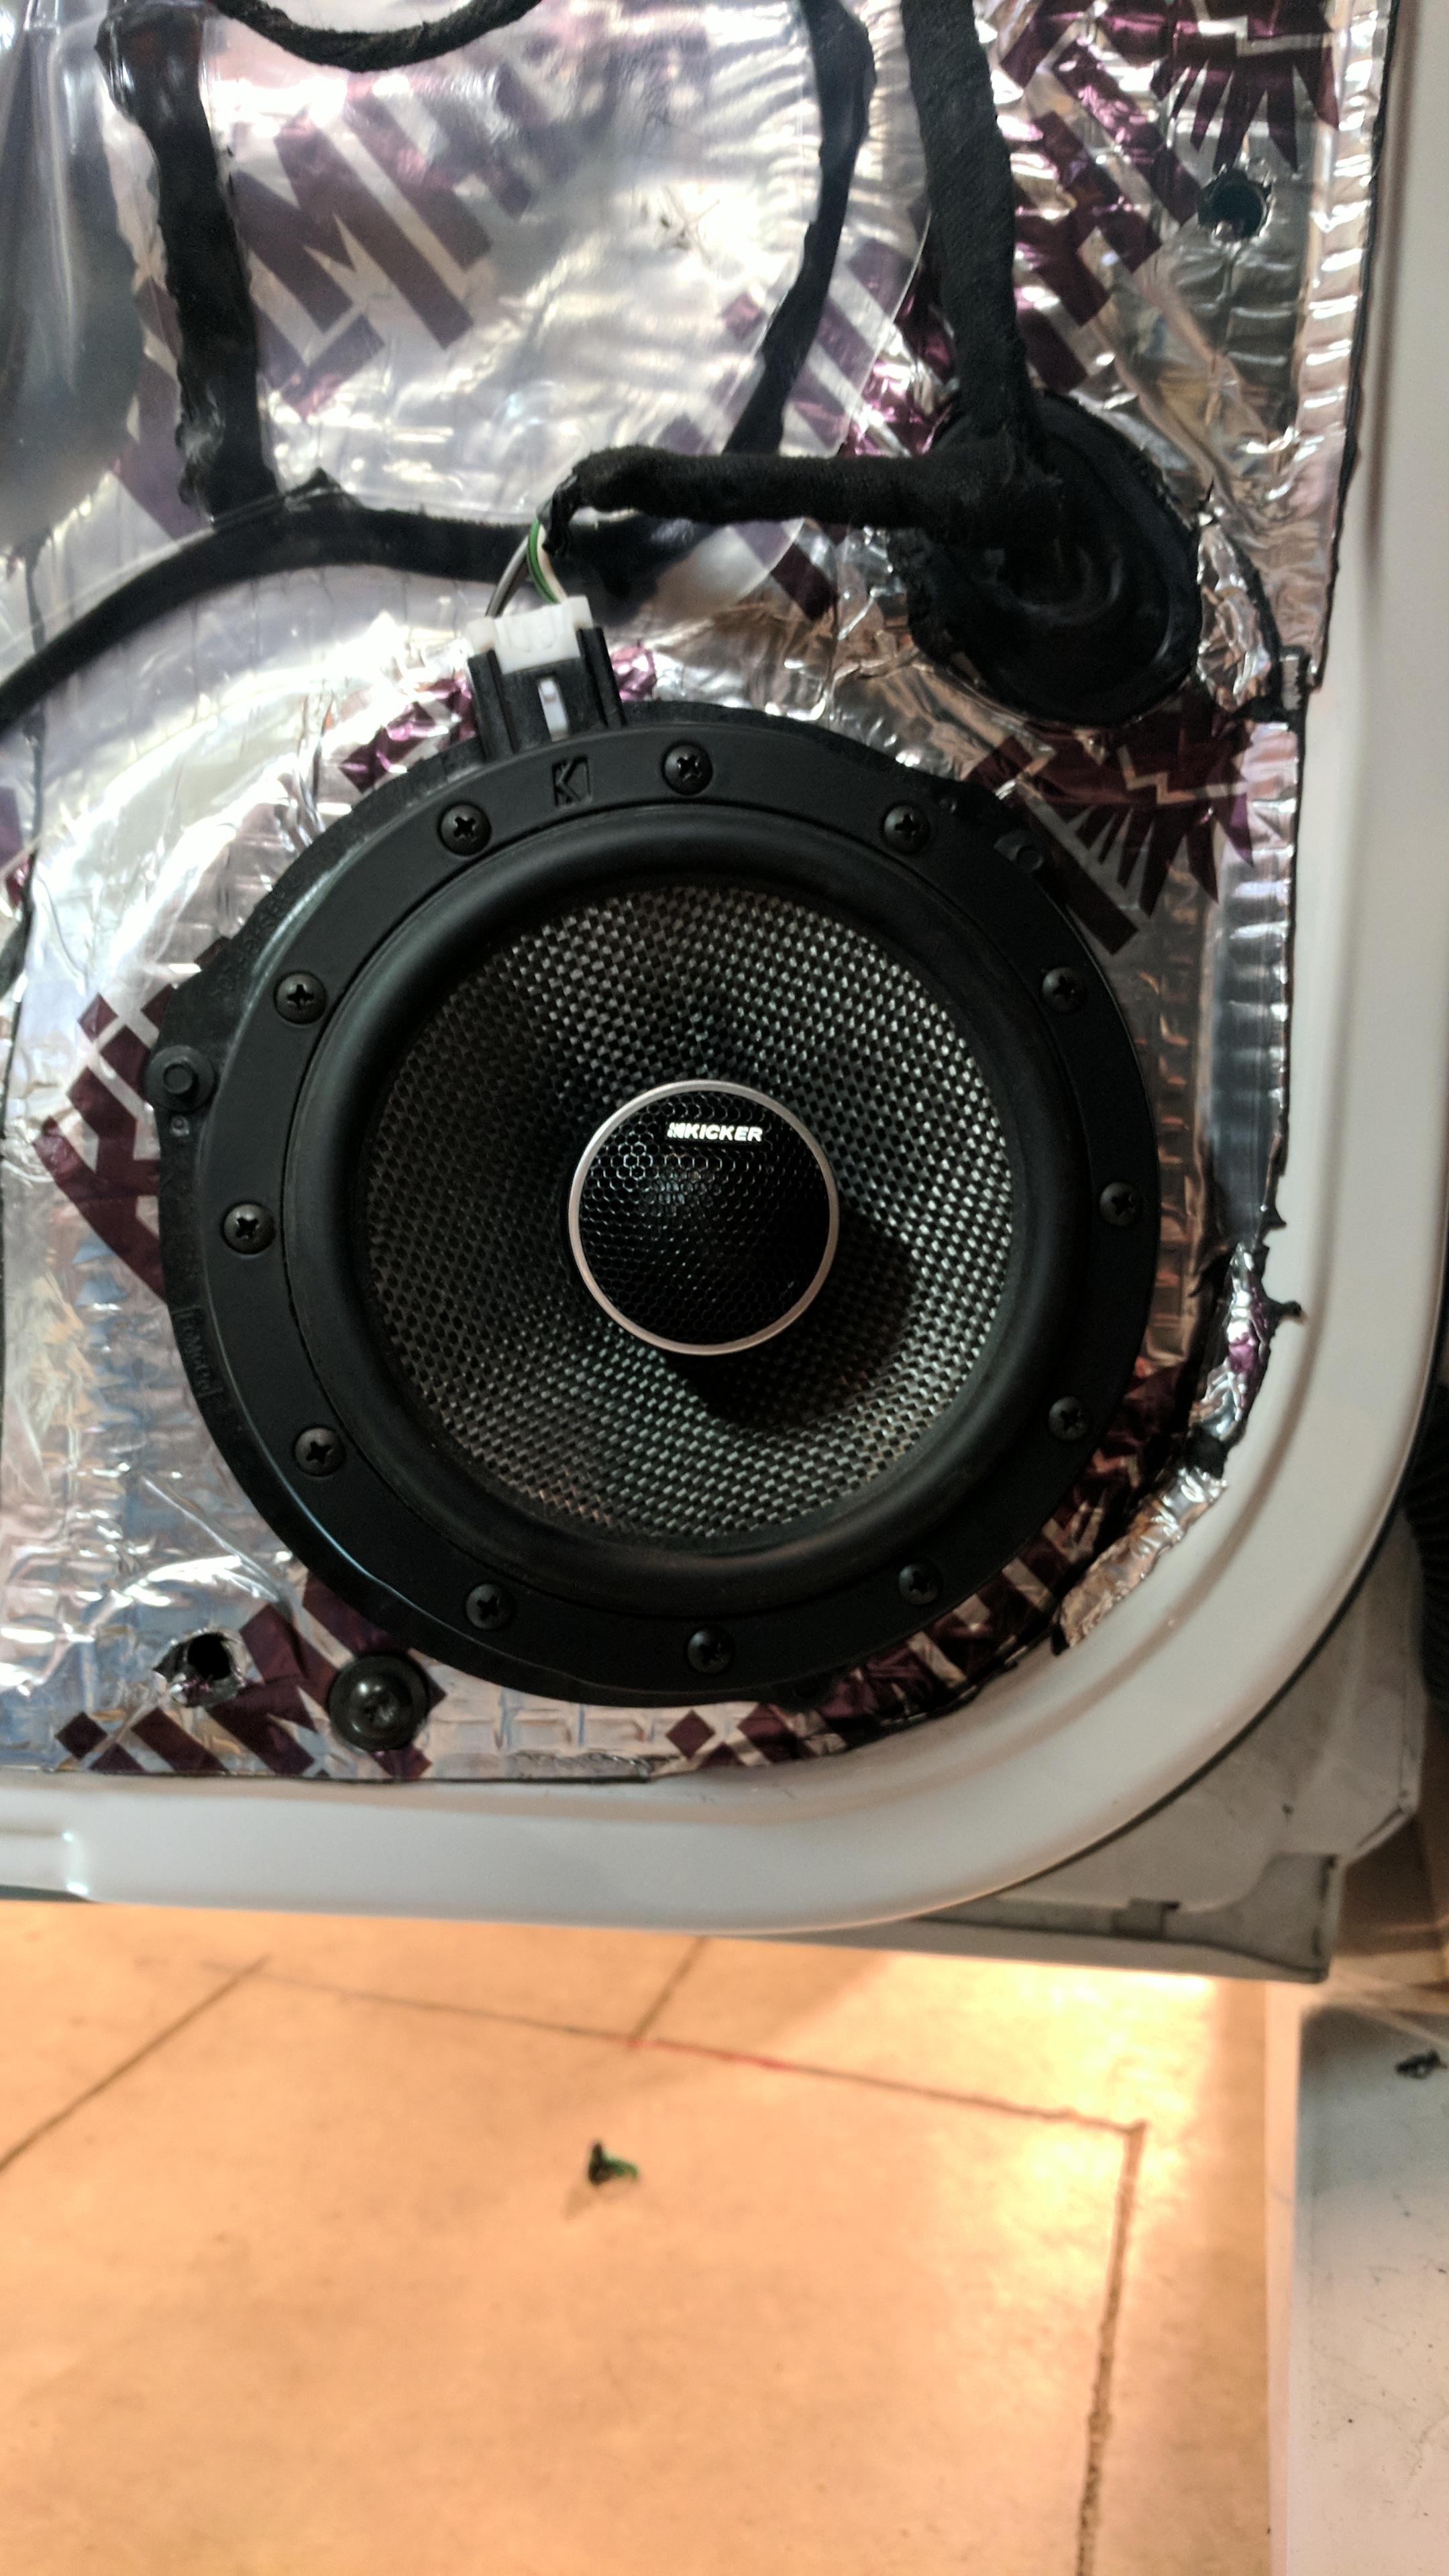 Need Speaker Wiring Guidance Rears Help Please Thread Helpplease Name Img 20171011 150037 Views 304 Size 208 Mb